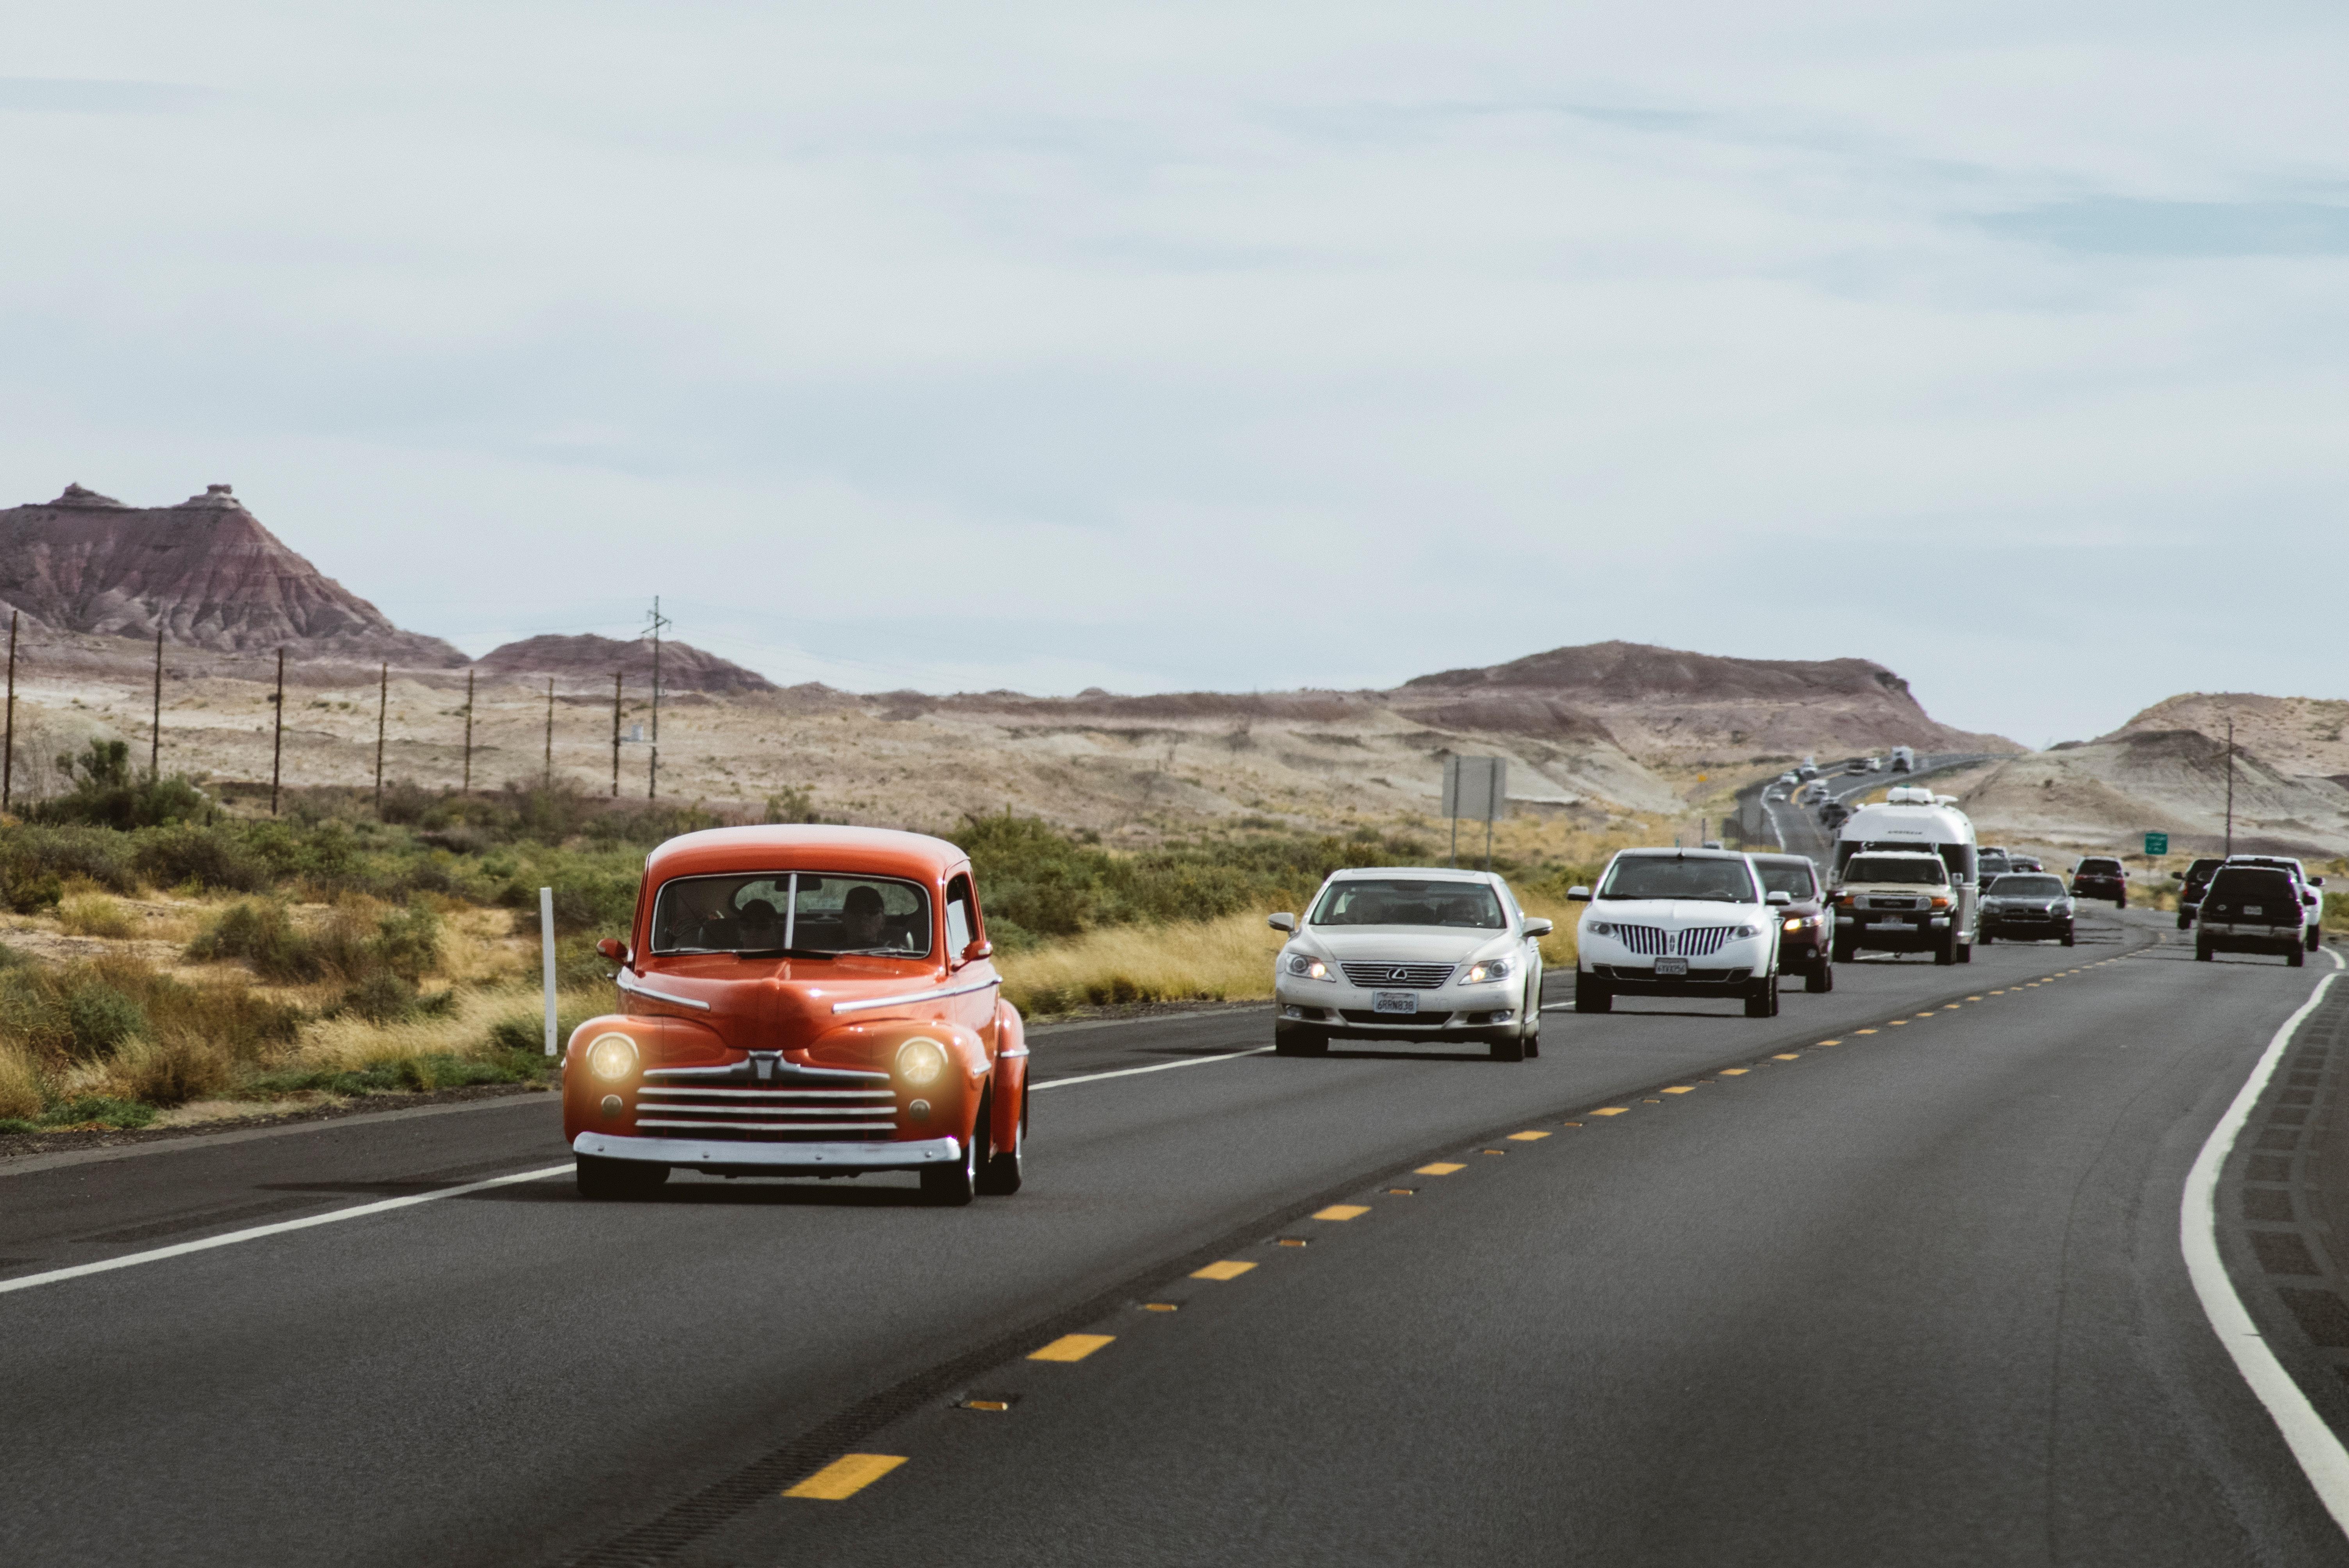 arizona-asphalt-automobiles-612888